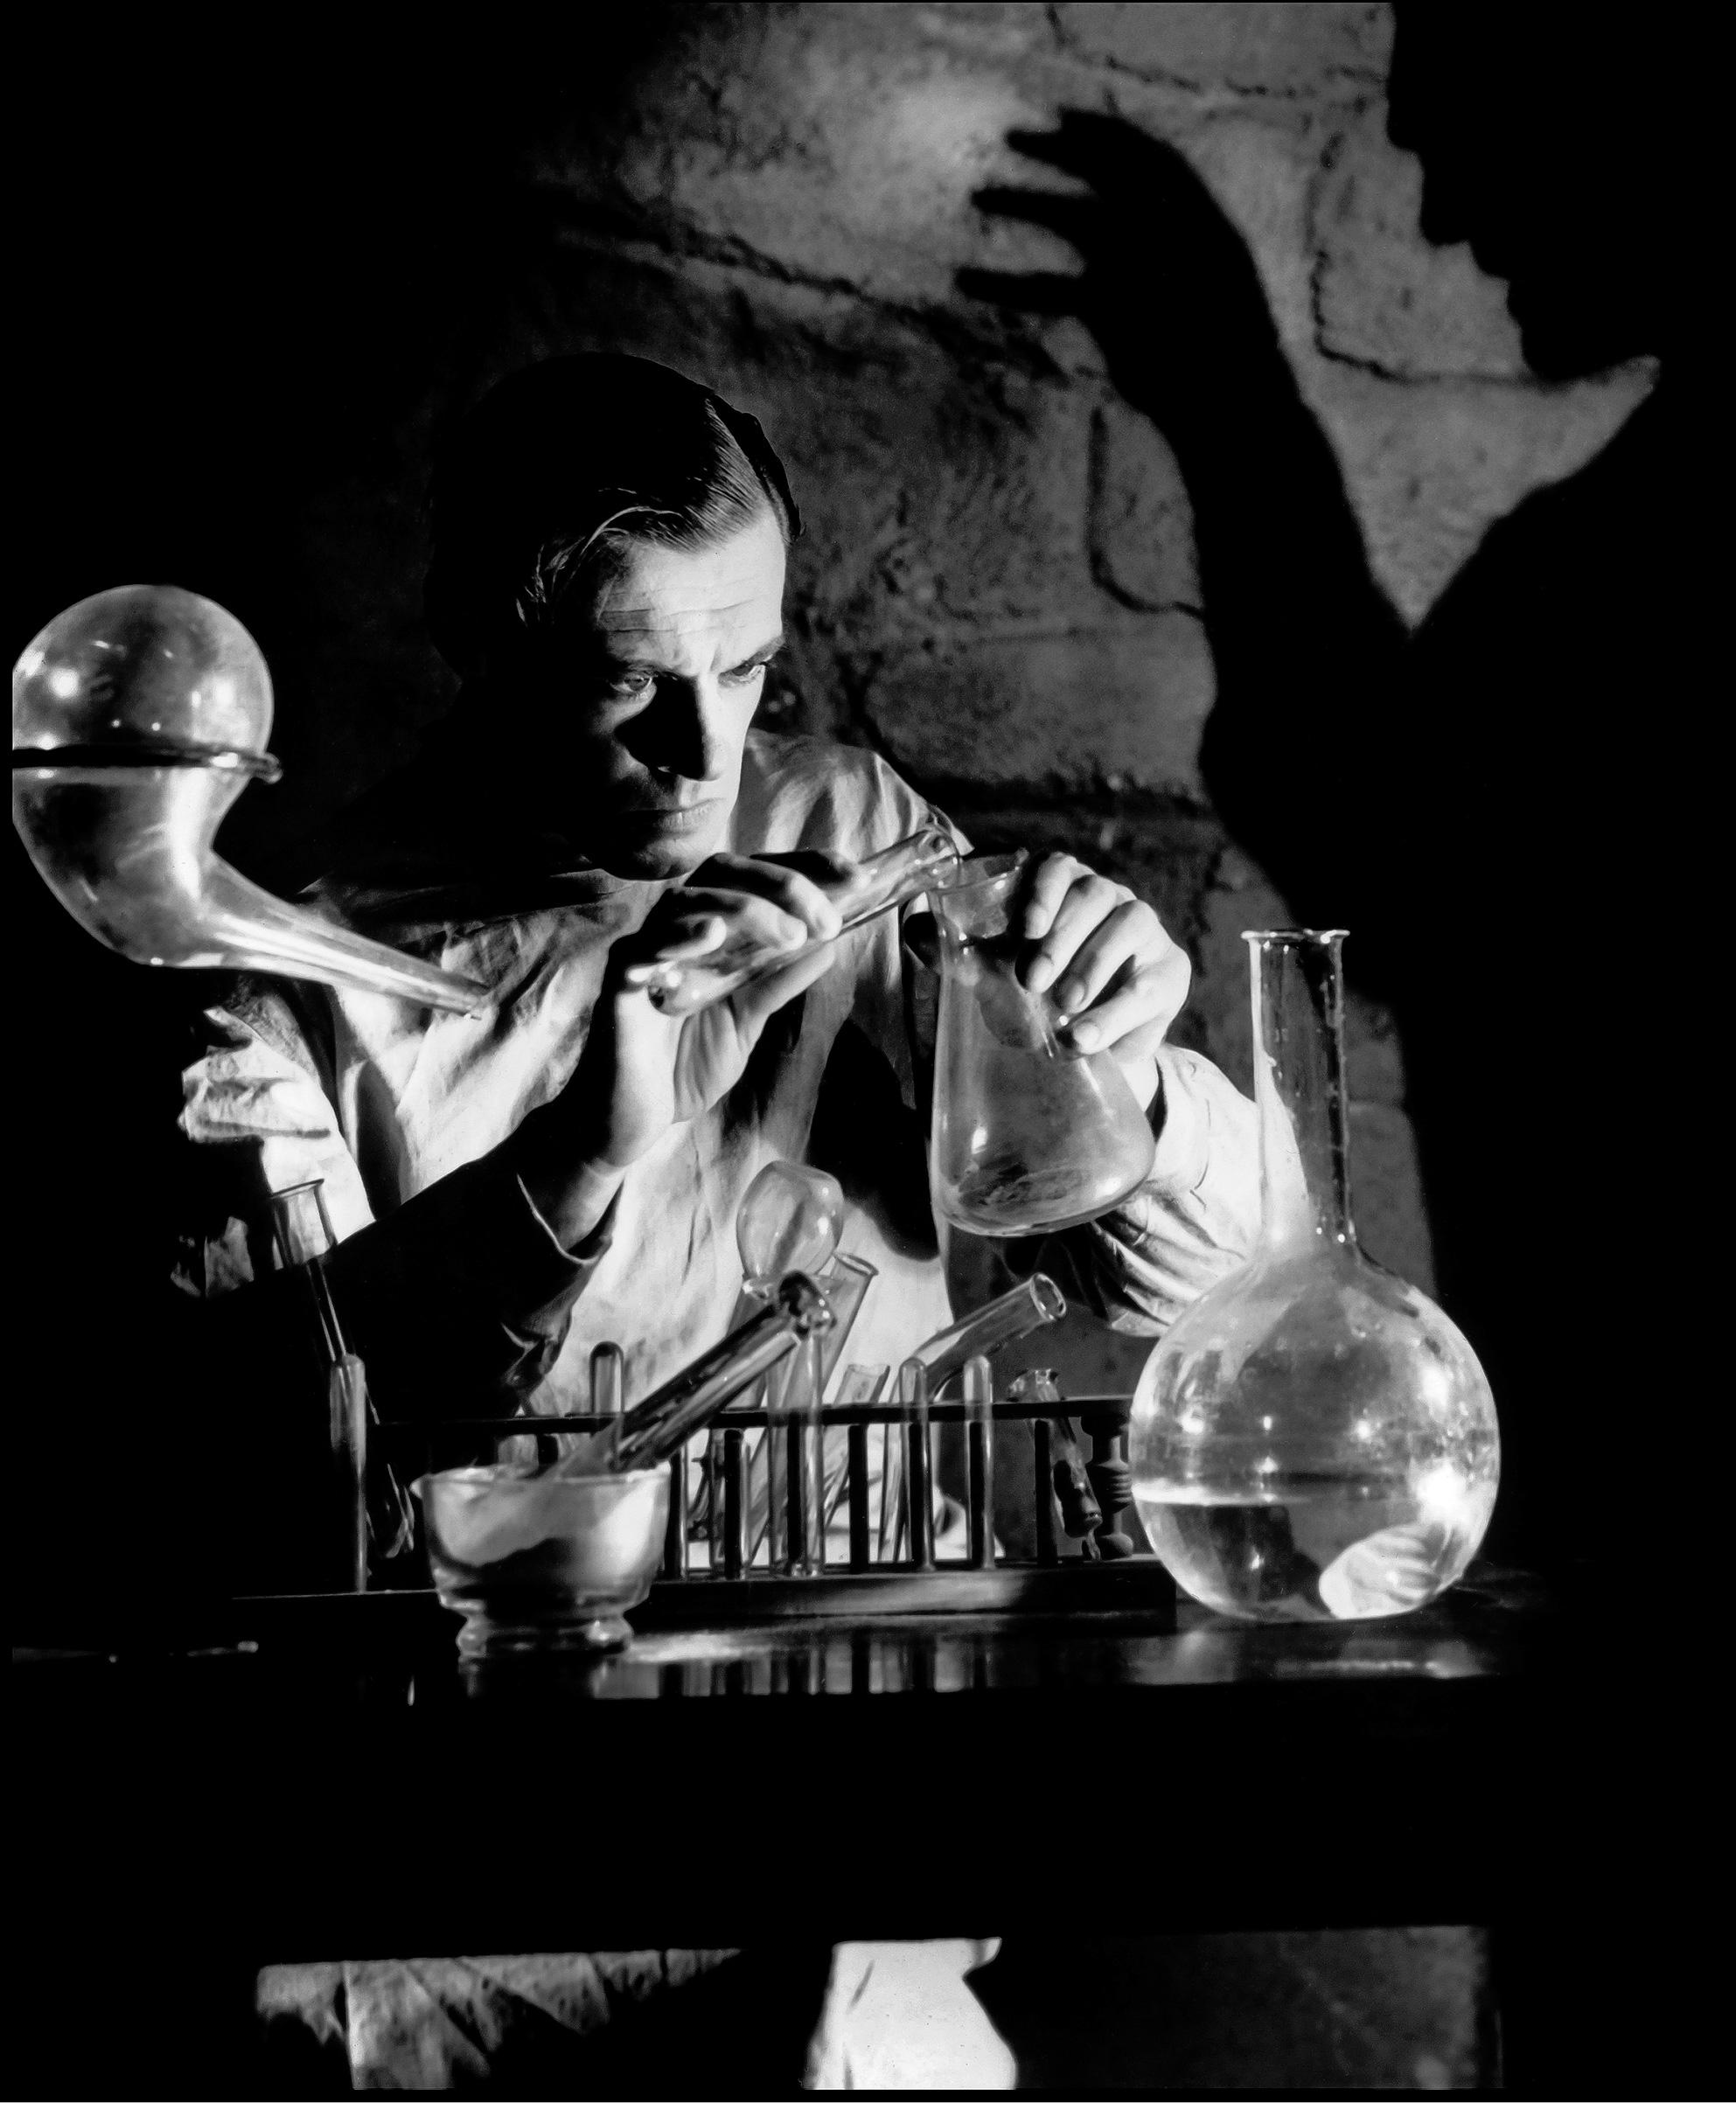 Colin Clive as Dr. Henry Frankenstein, in a publicity still for James Whale's Frankenstein (1931).